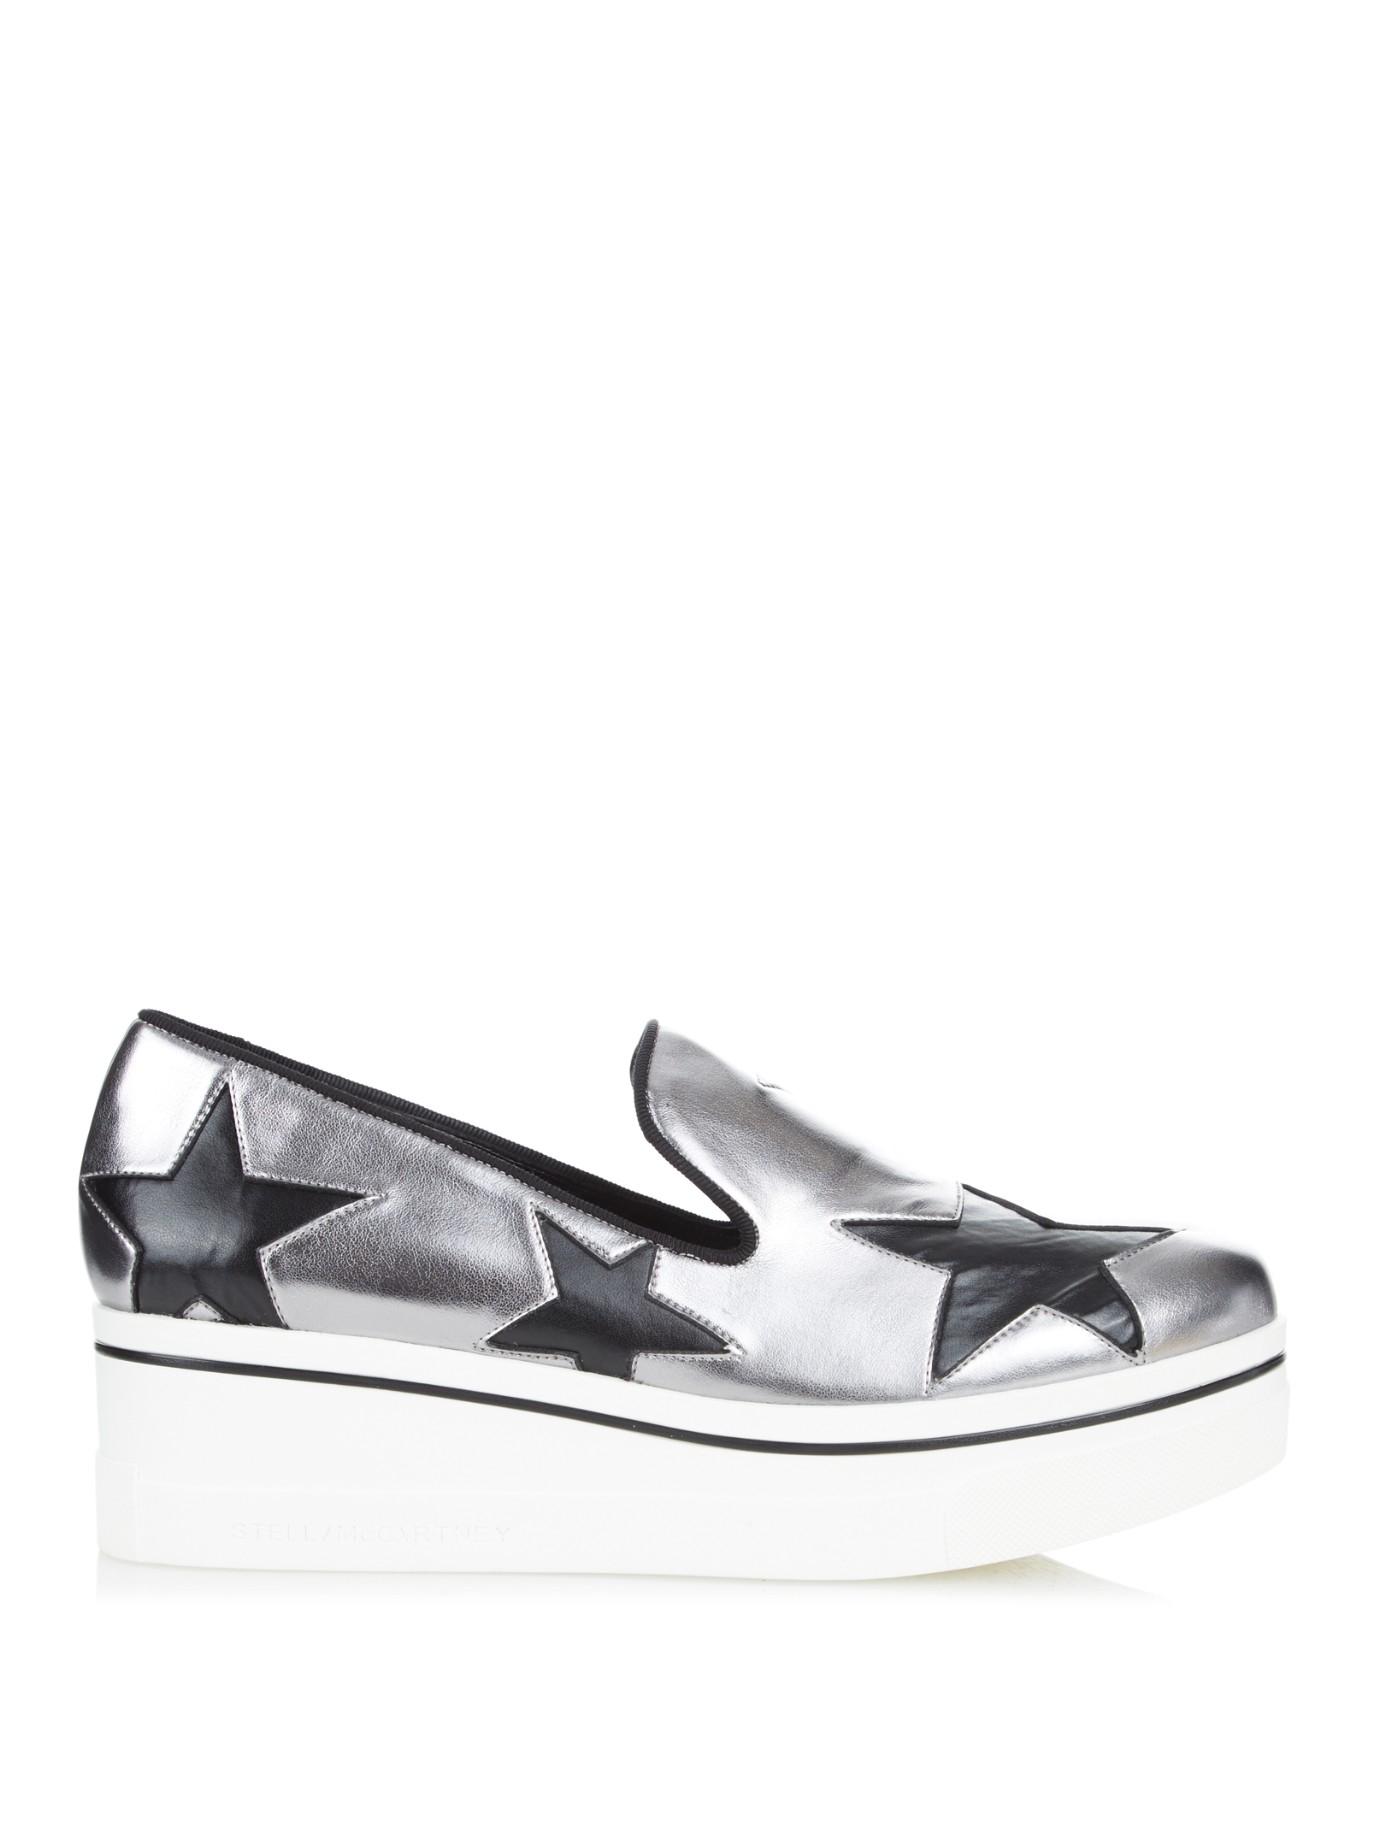 80fa81b8f09 Stella McCartney Binx Metallic Faux-leather Flatform Loafers in ...